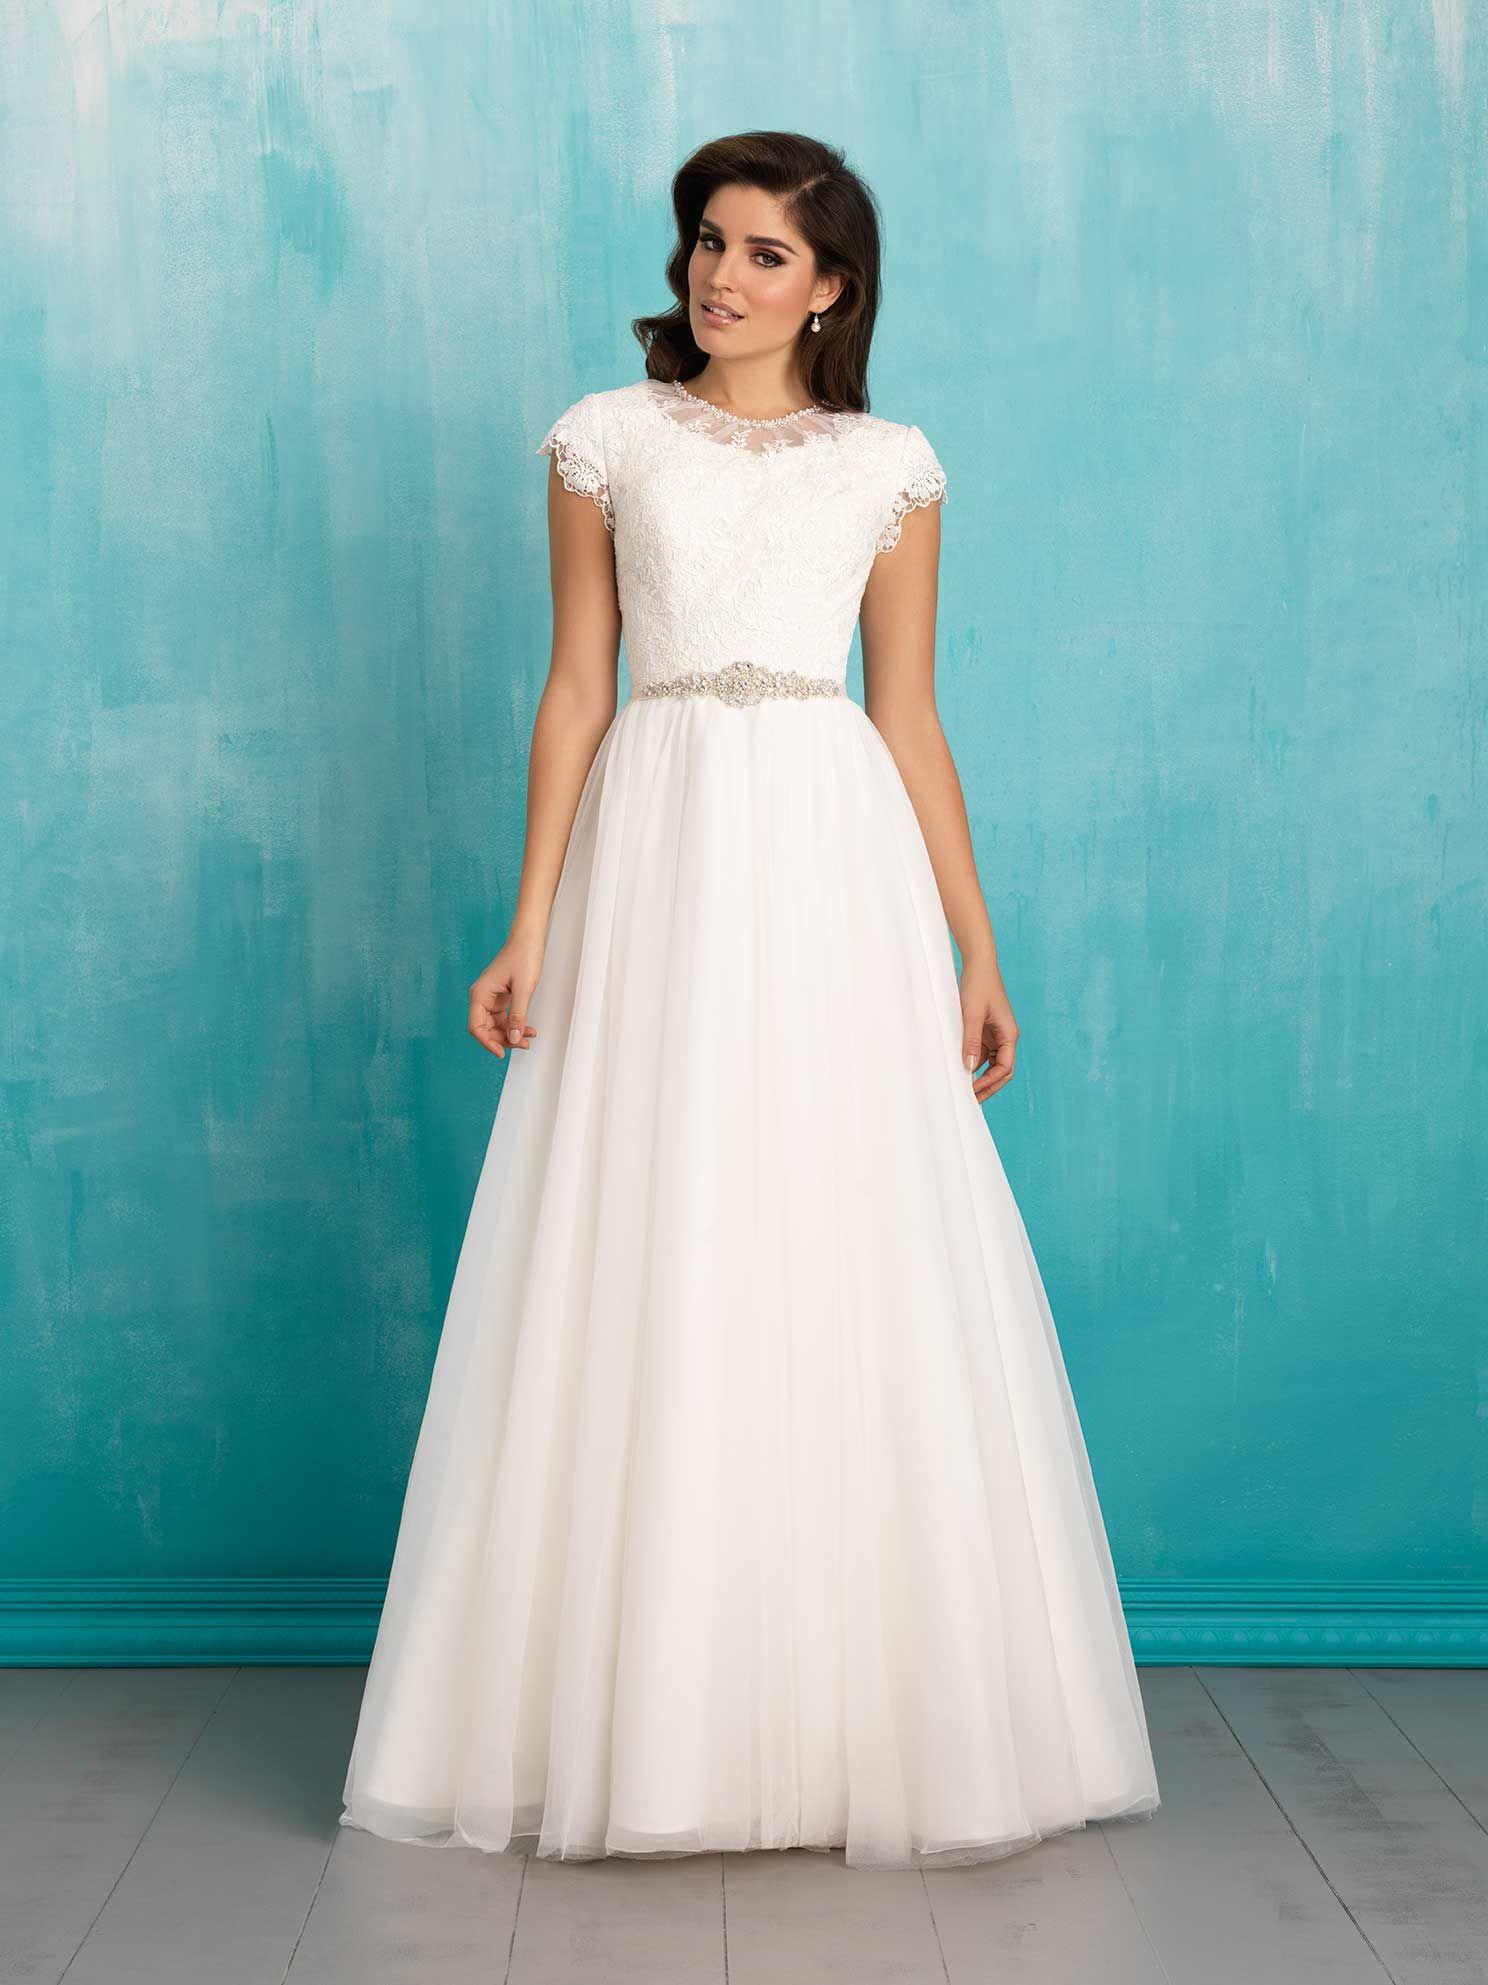 Allure Bridal Modest collection | Modest Wedding Dresses | Pinterest ...